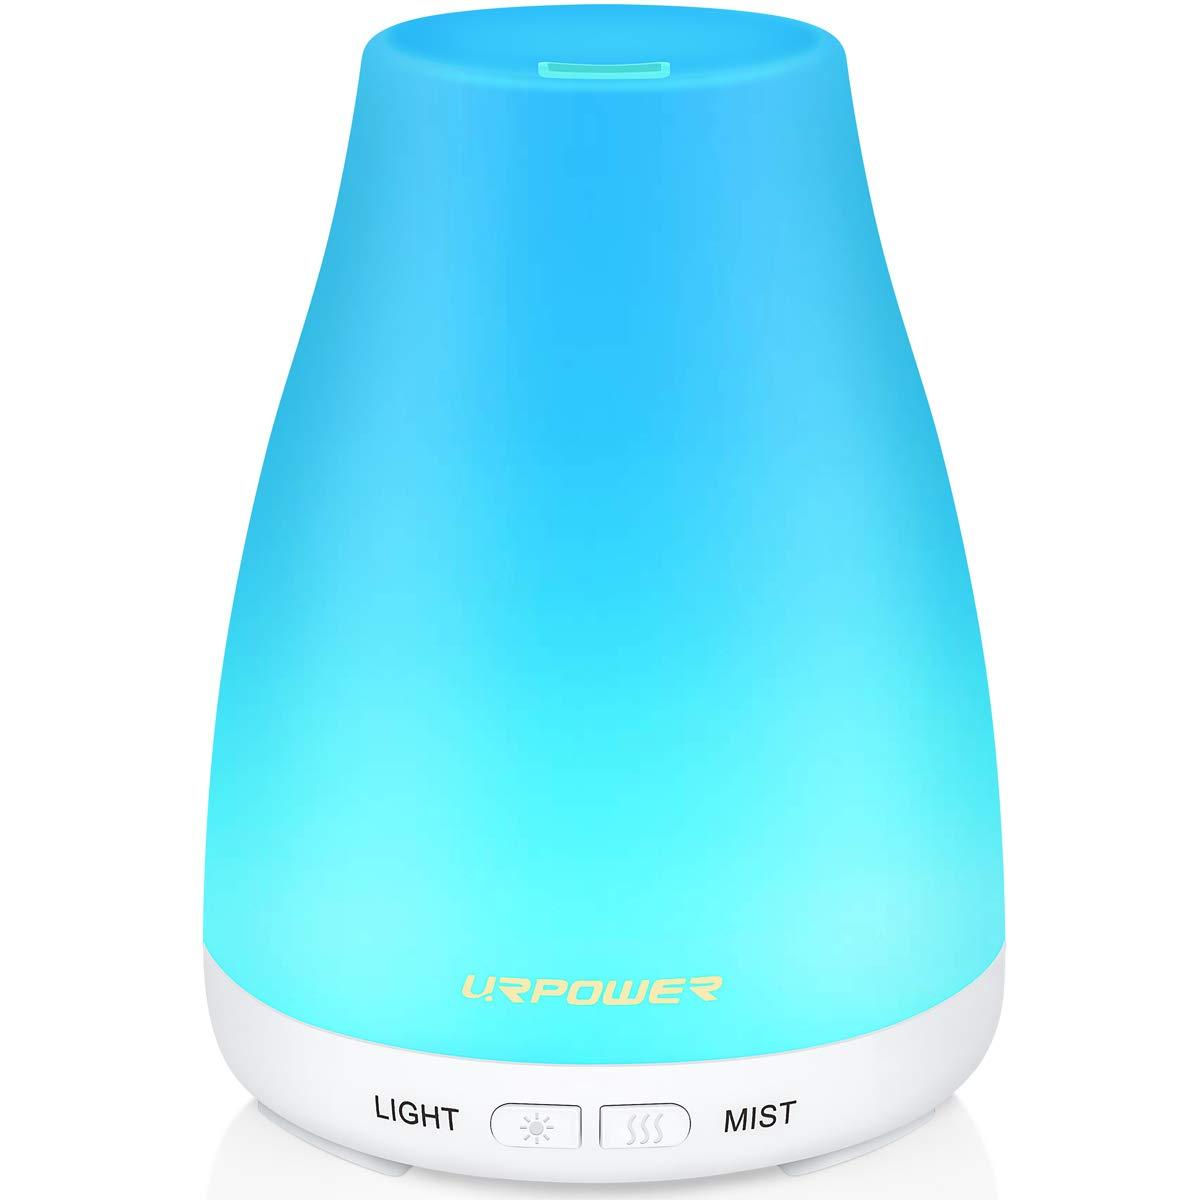 URPOWER Essential Humidifier Adjustable Waterless